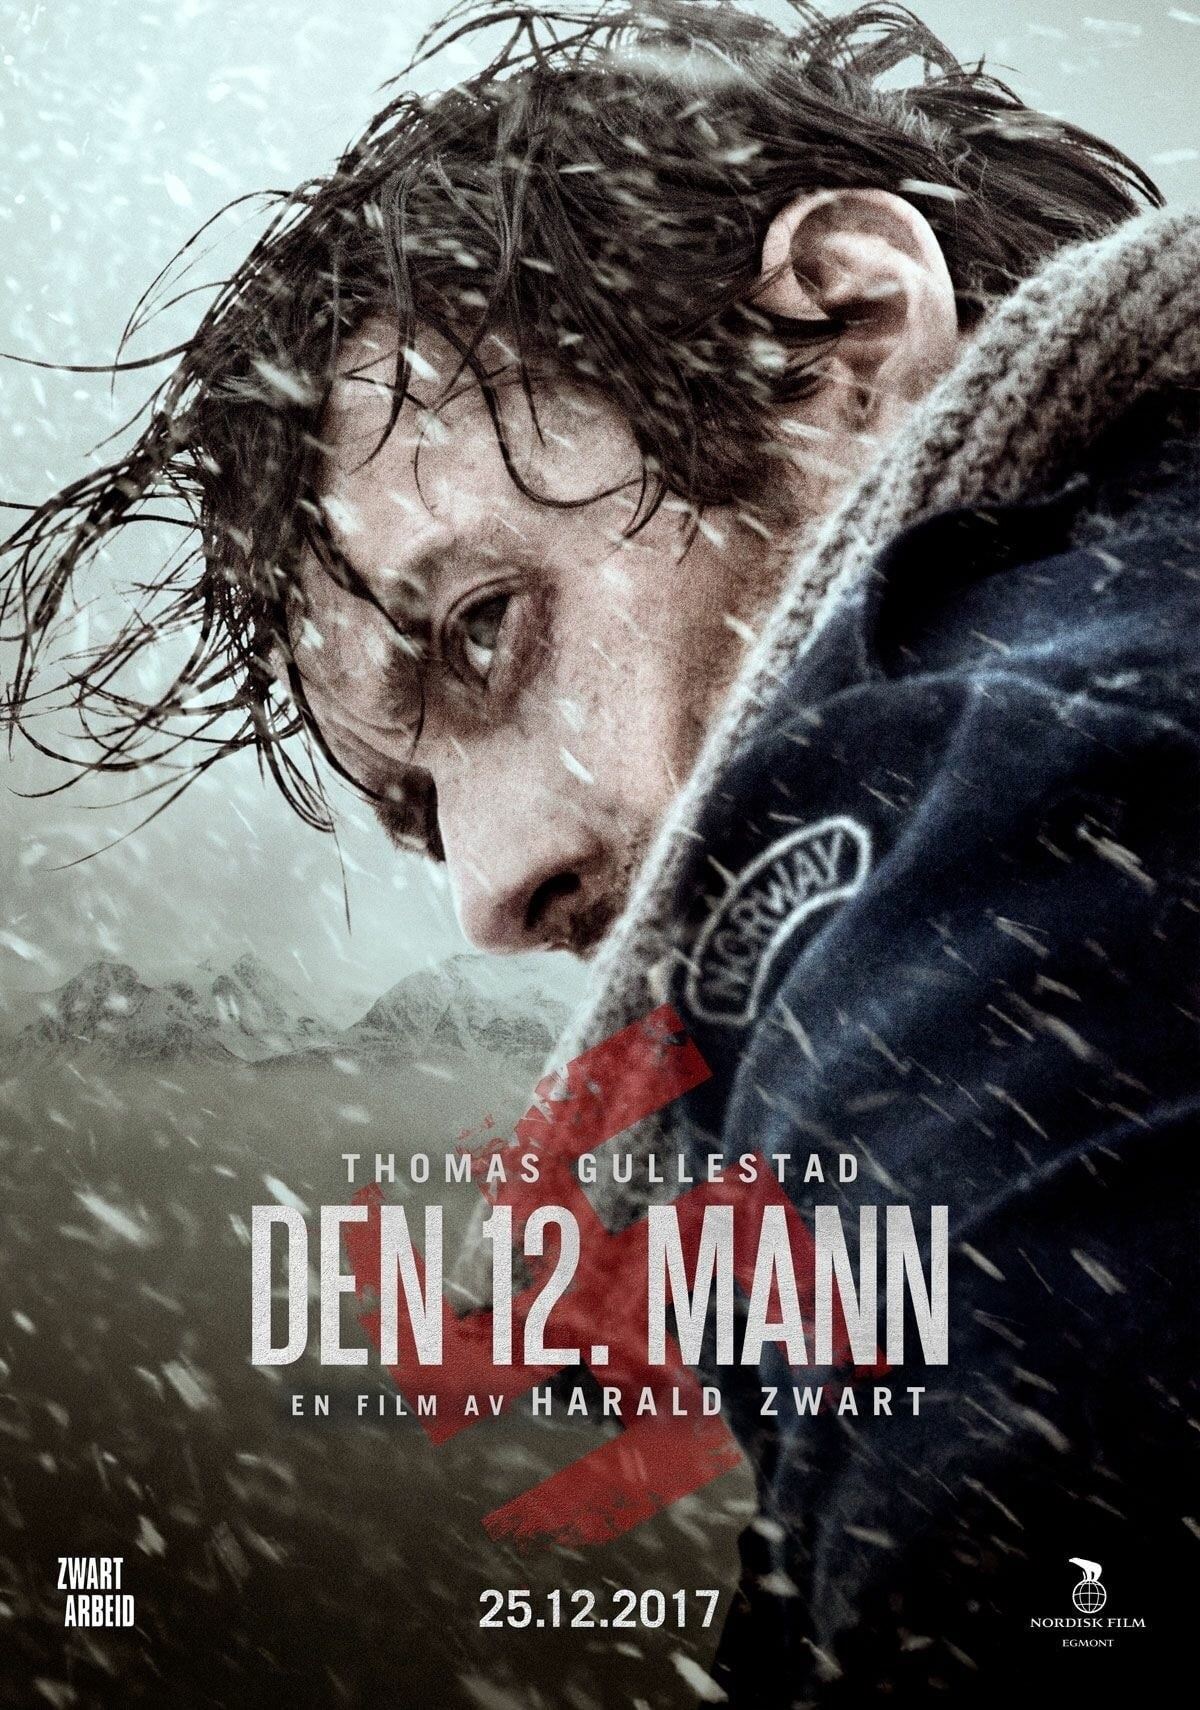 The 12 Man